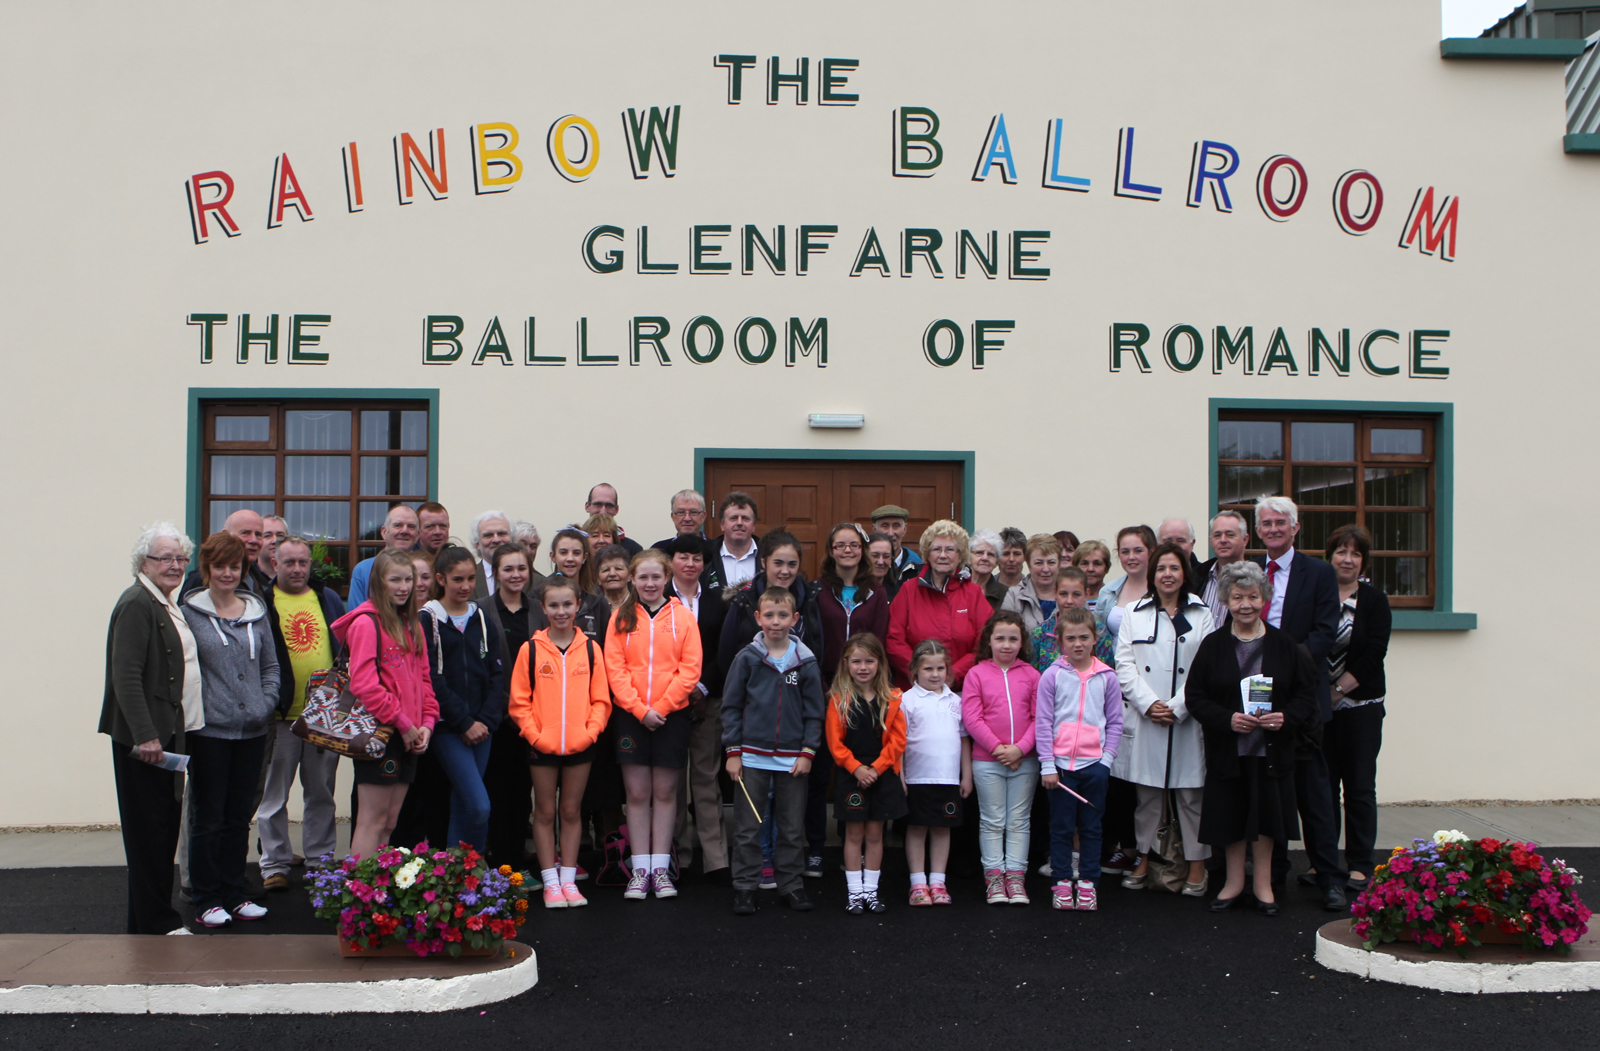 Glenfarne Pride of Place The Rainbow ballroom of Romance Glenfarne Co Leitrim